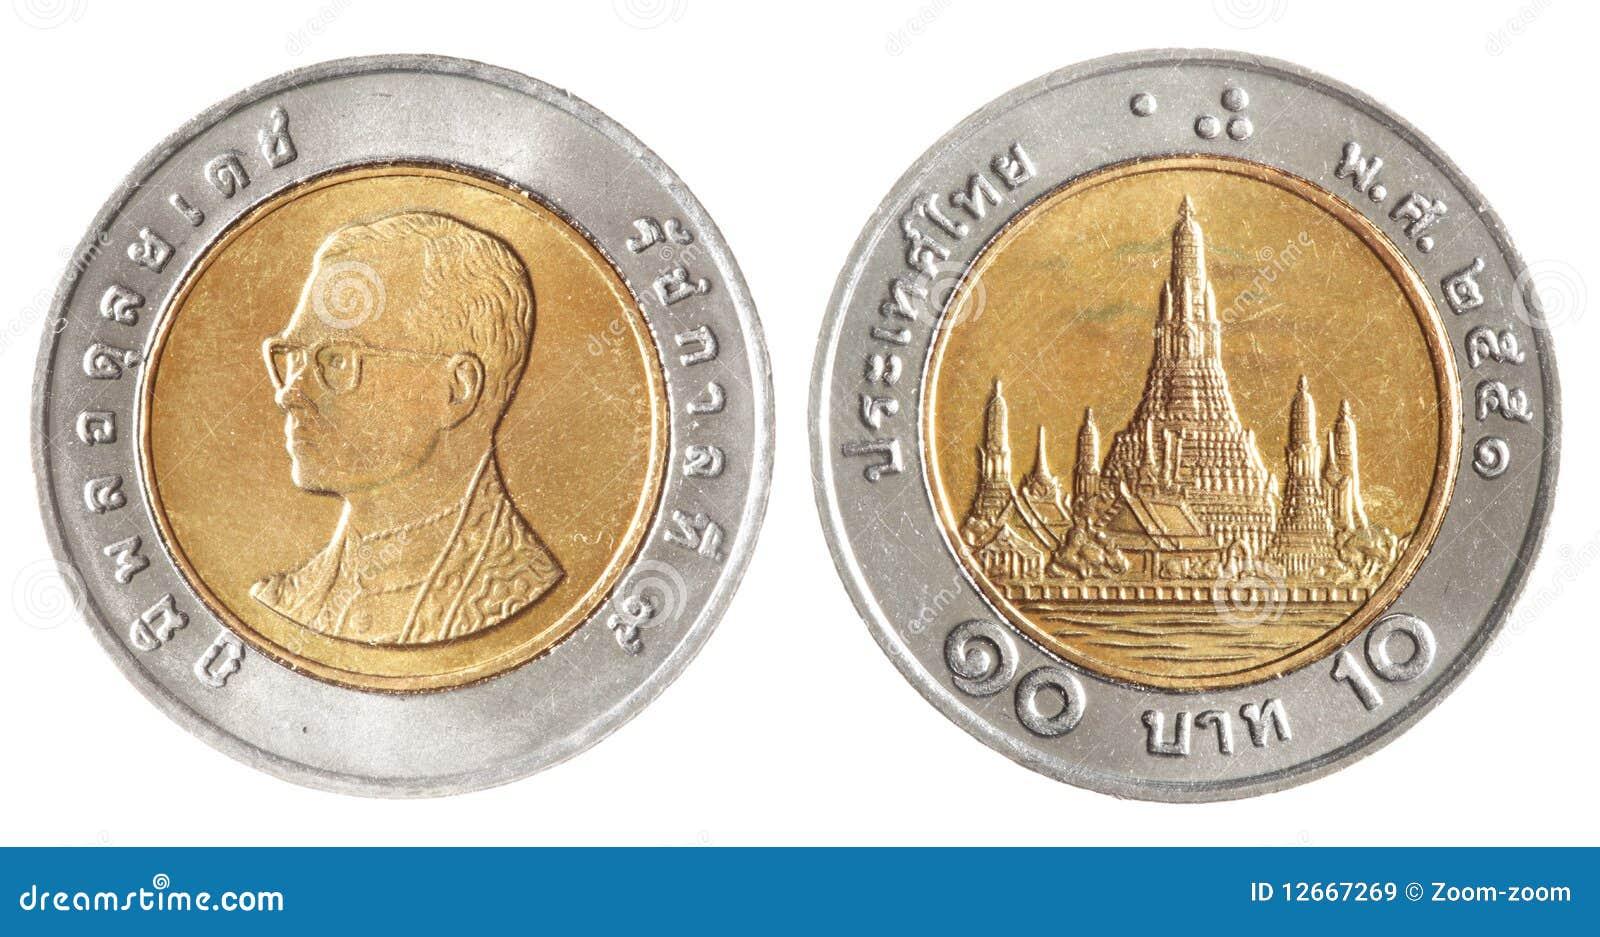 thai ten baht coin